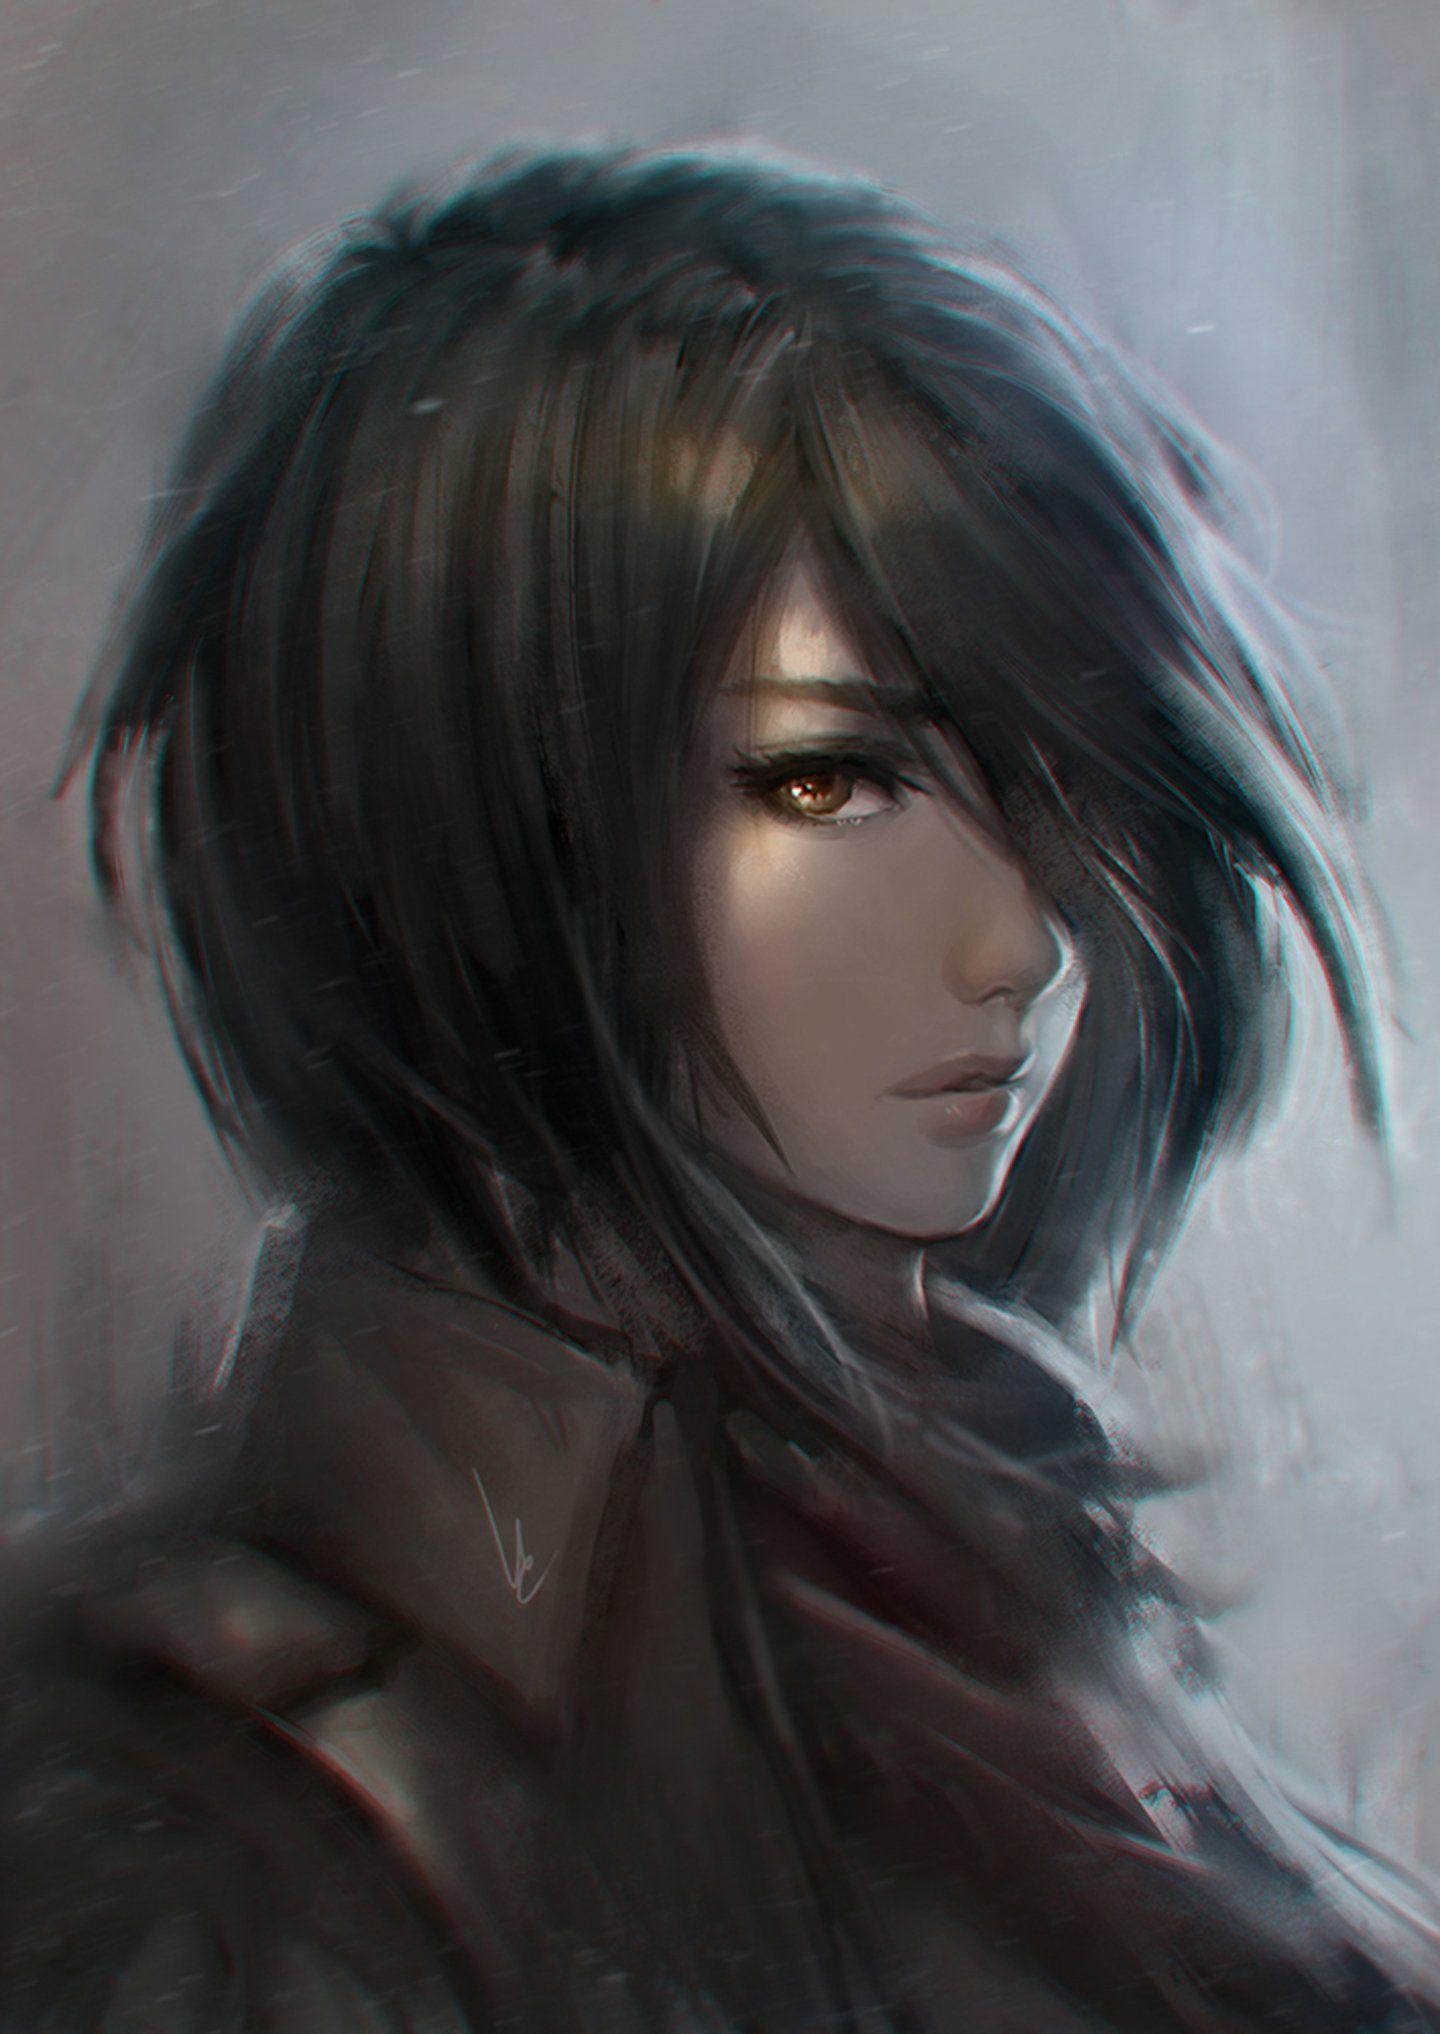 Anime Series Character Girl Short Hair Popular Anime Attack On Titan Anime Digital Portrait